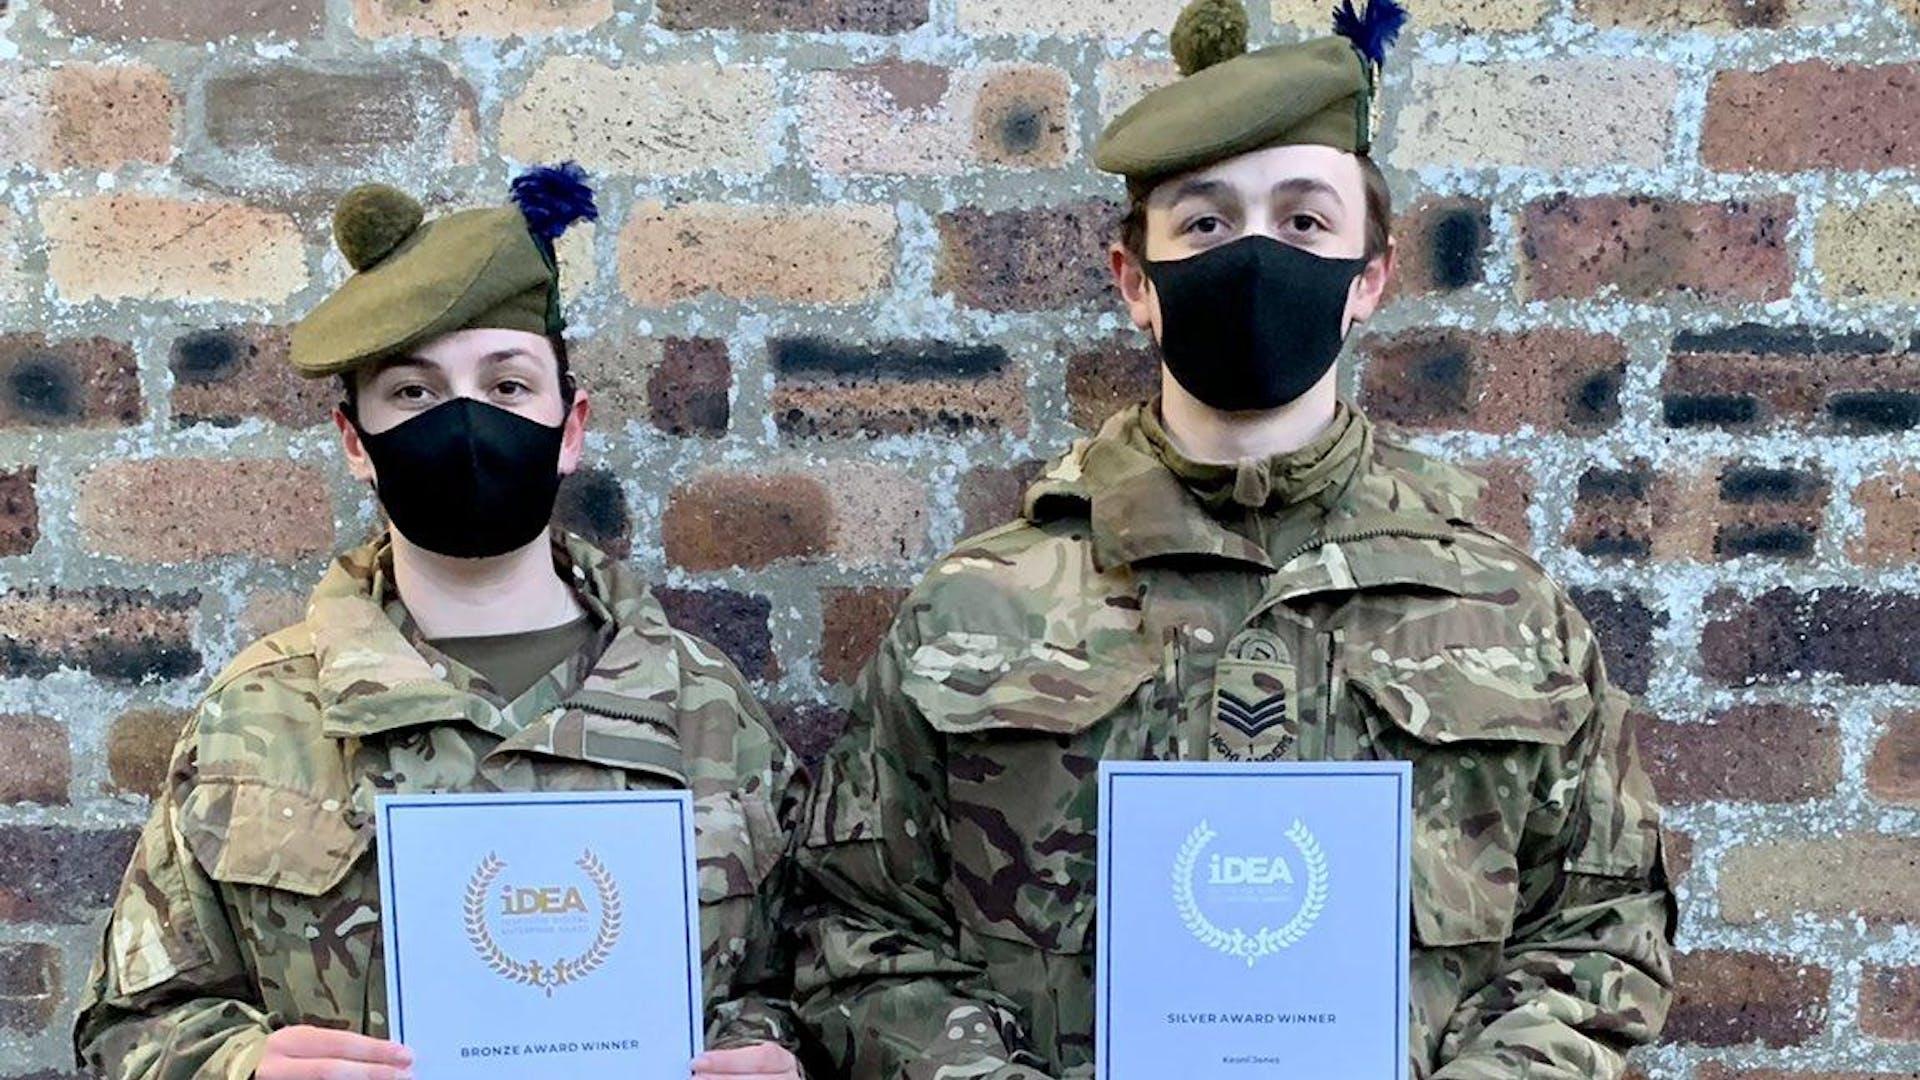 PI Jones left and Sgt Jones right with their i DEA awards